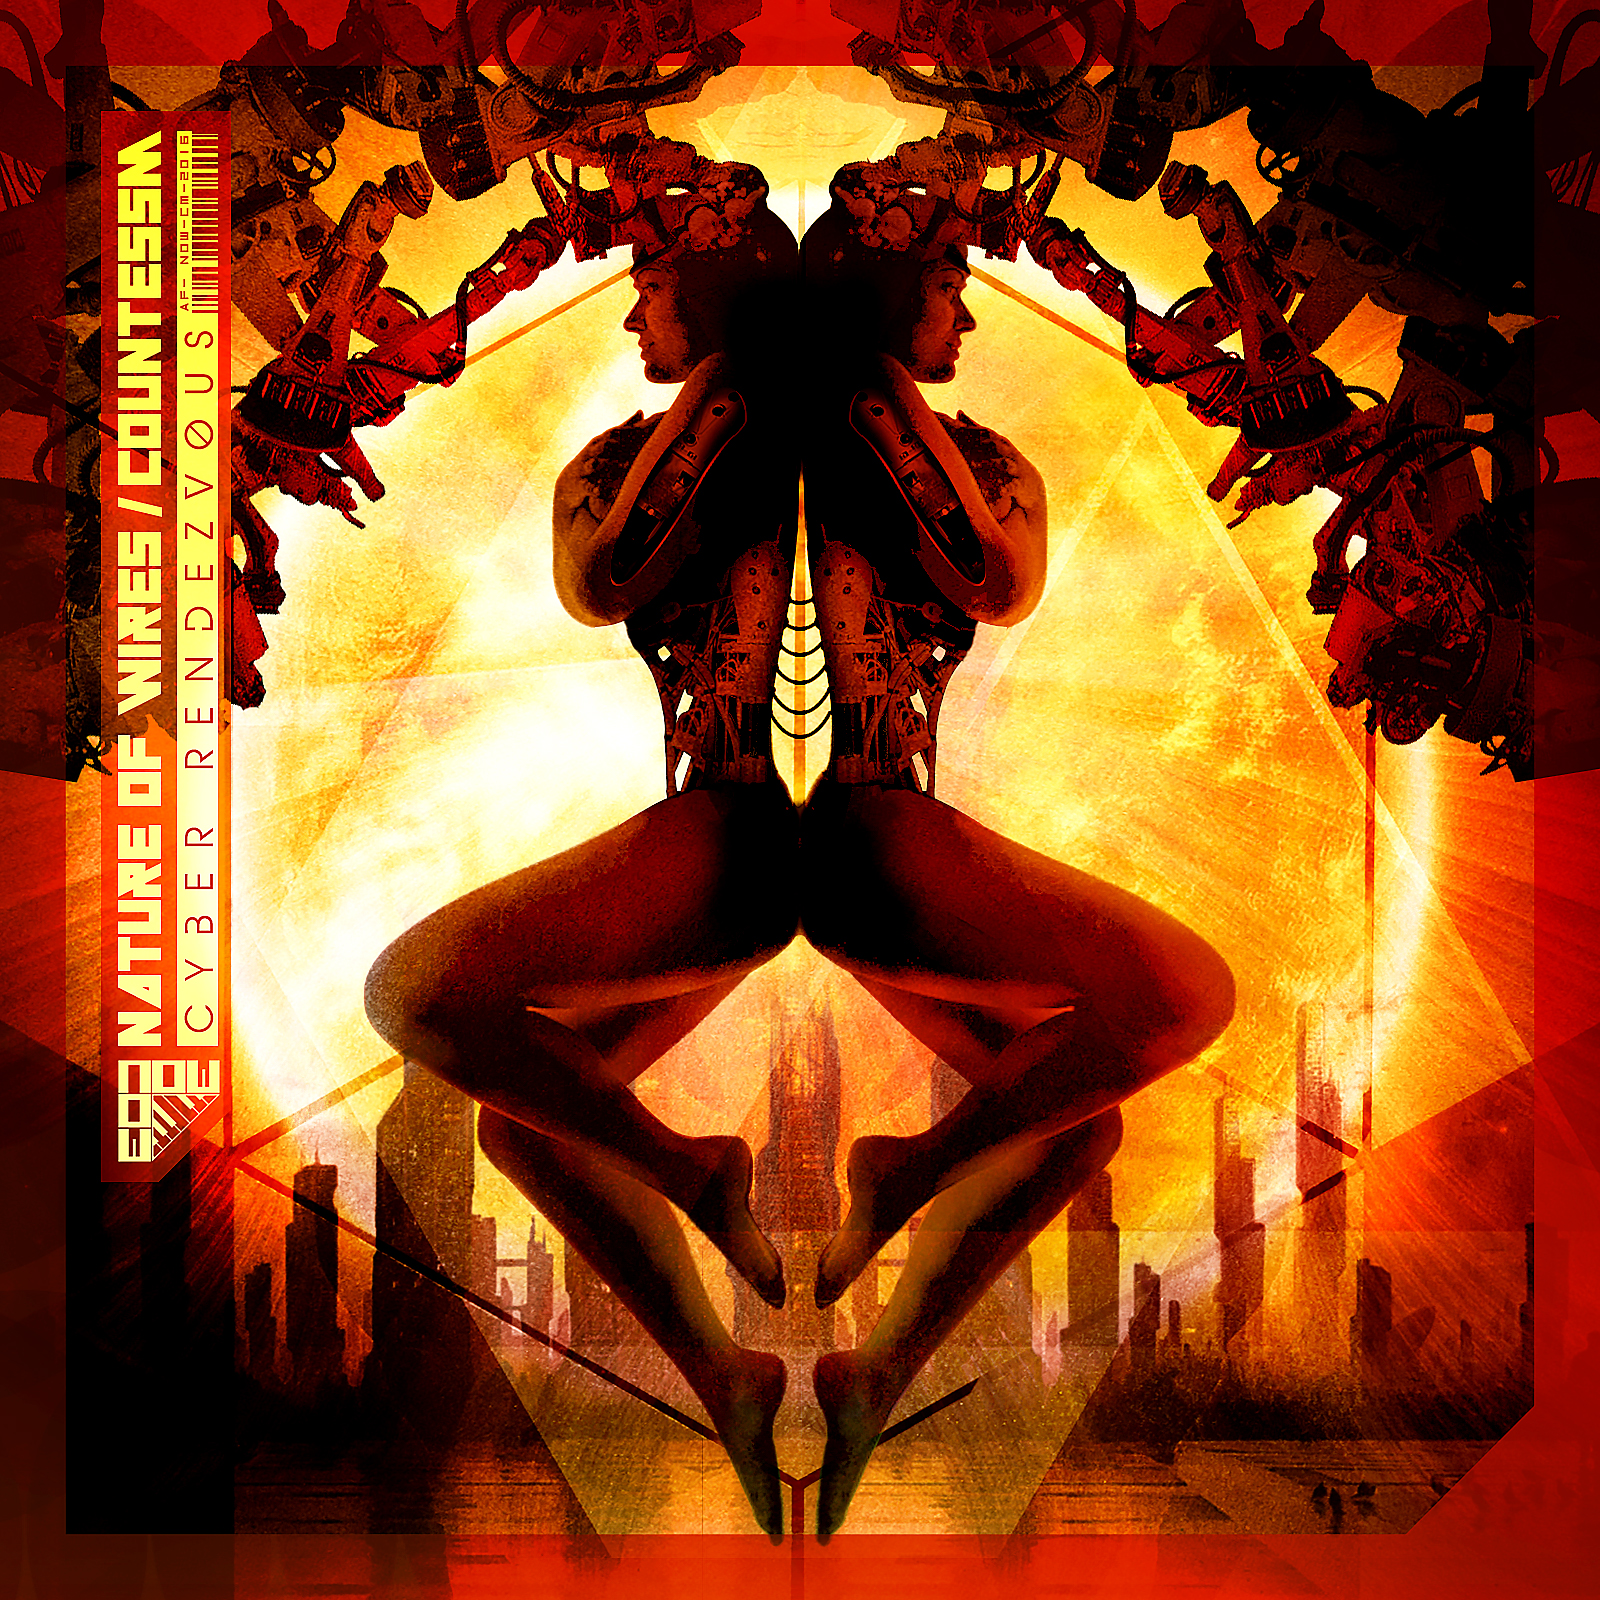 Nature of Wires / CountessM - Cyber Rendezvous (+ bonus digital remixes)